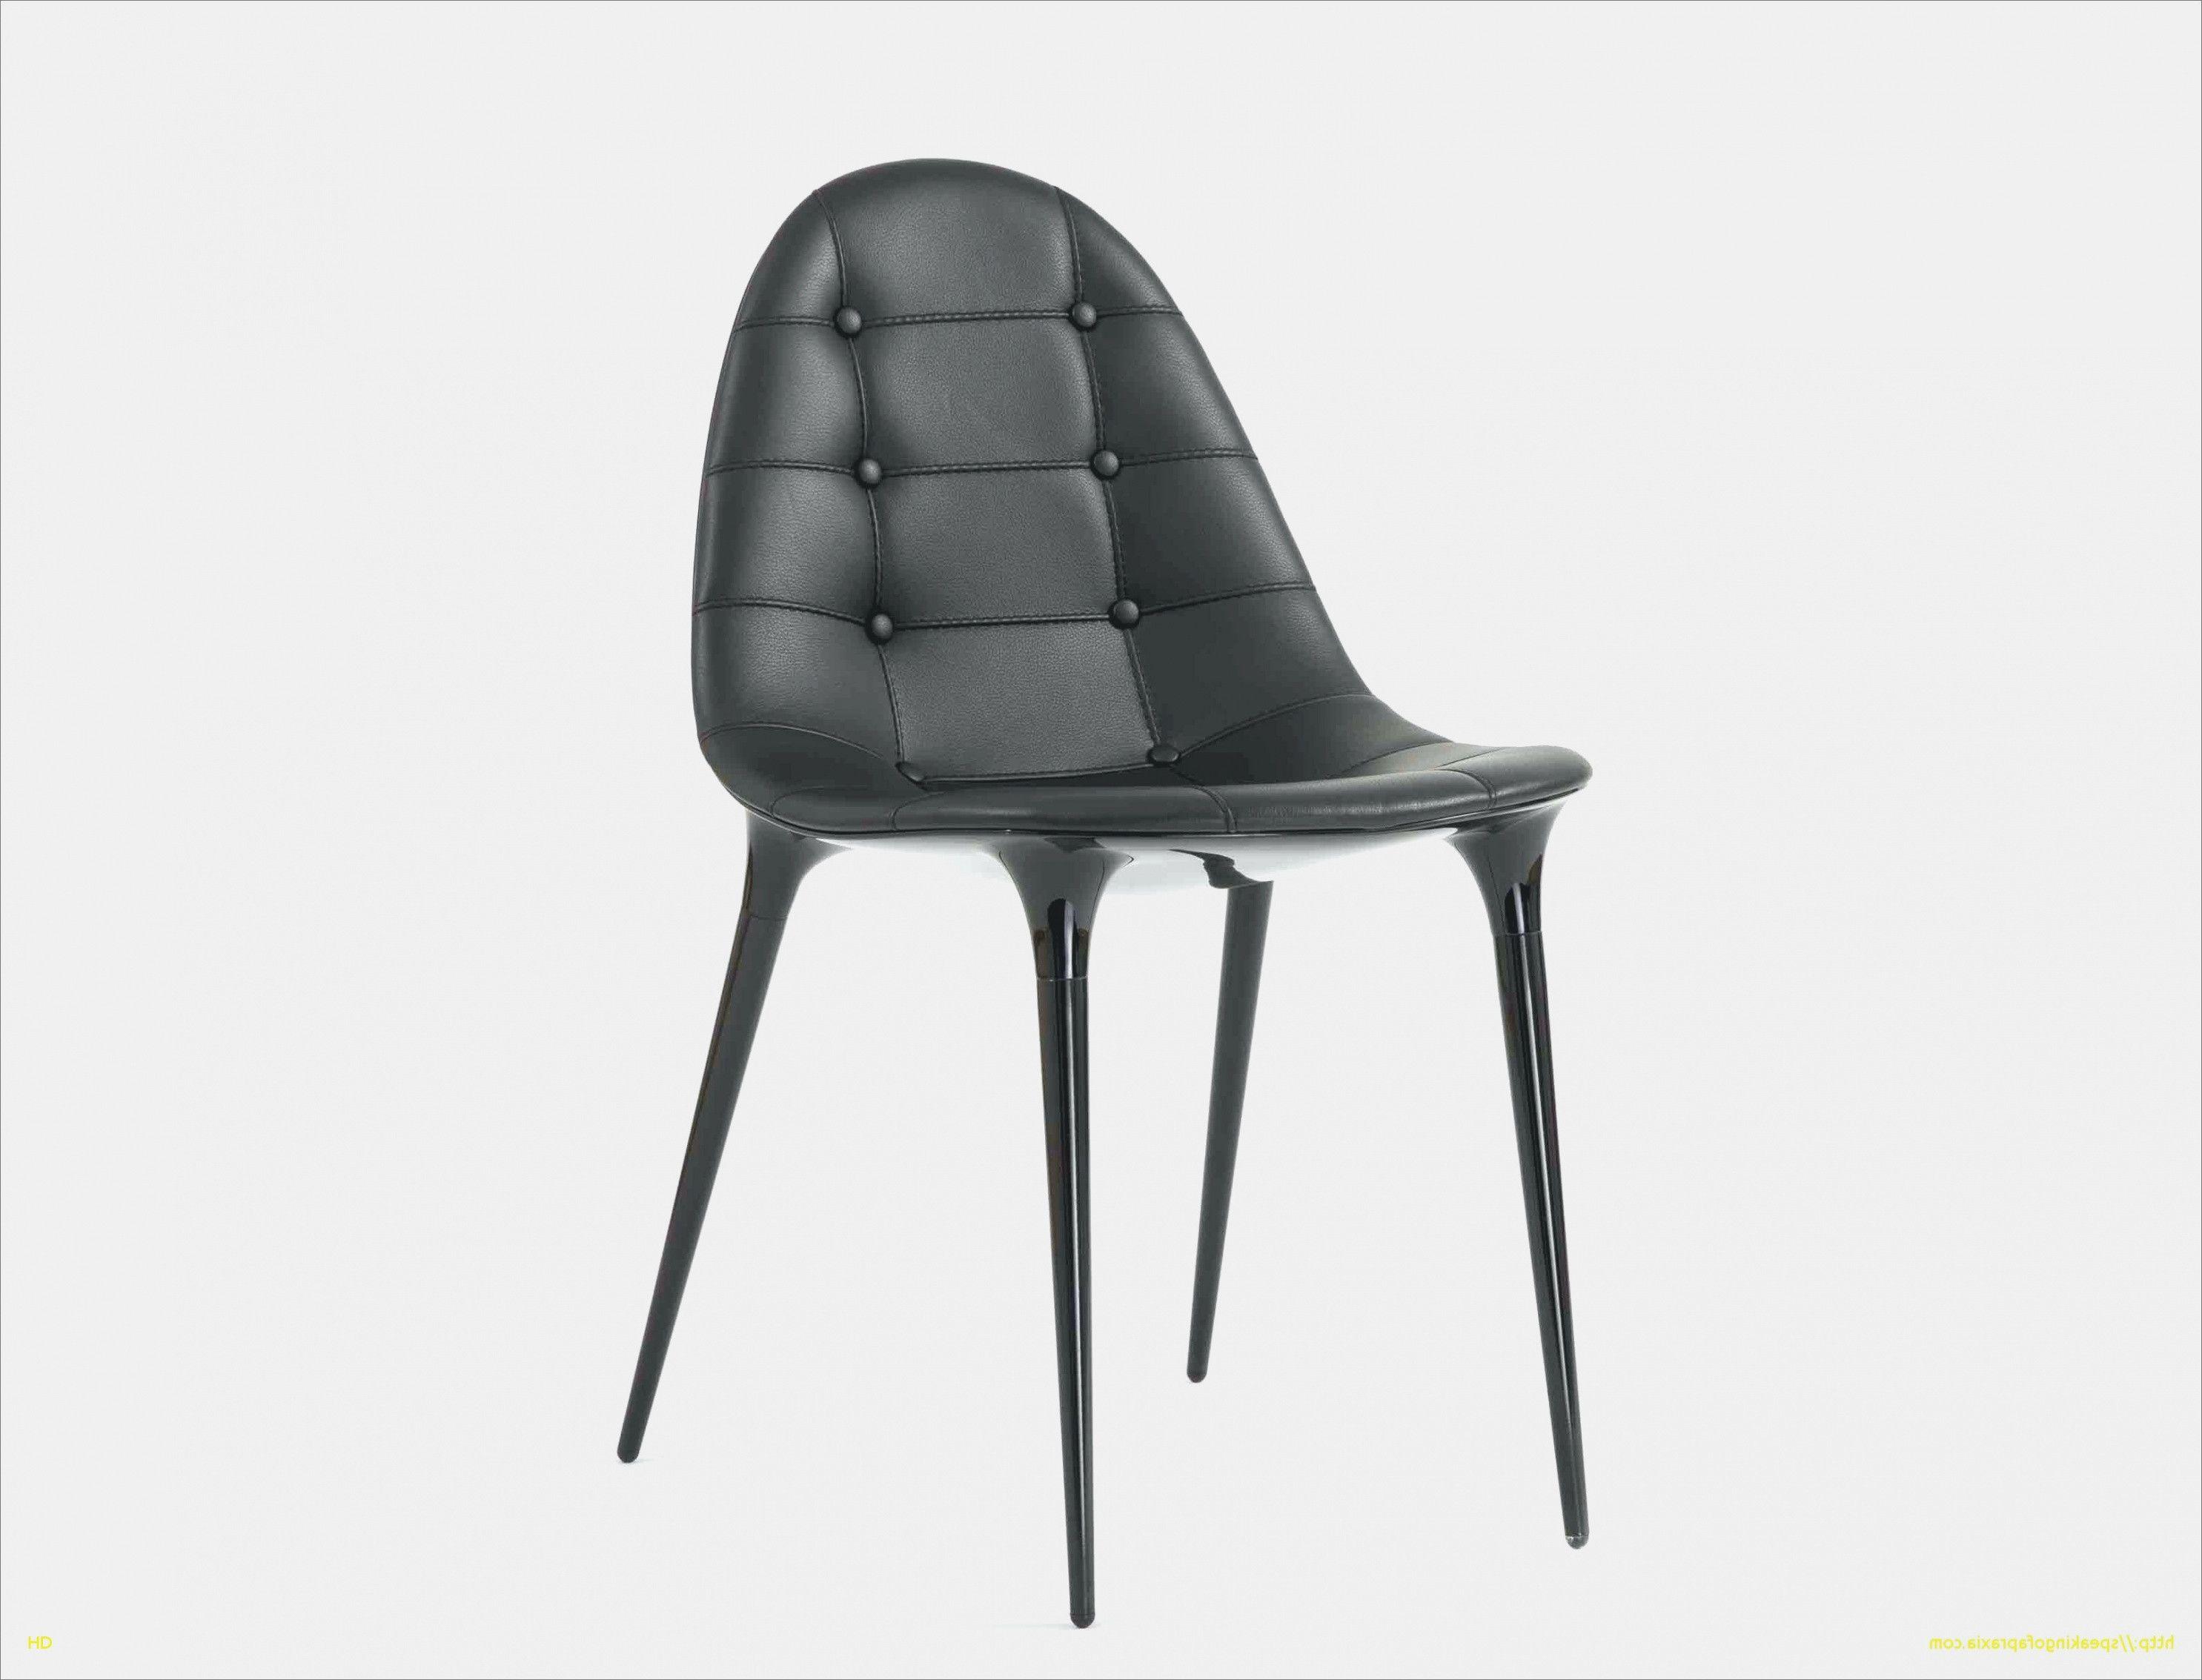 35 Impressionnant Chaise Haute Moderne Inspirations Chaise Design Chaise Rotin Chaise Haute